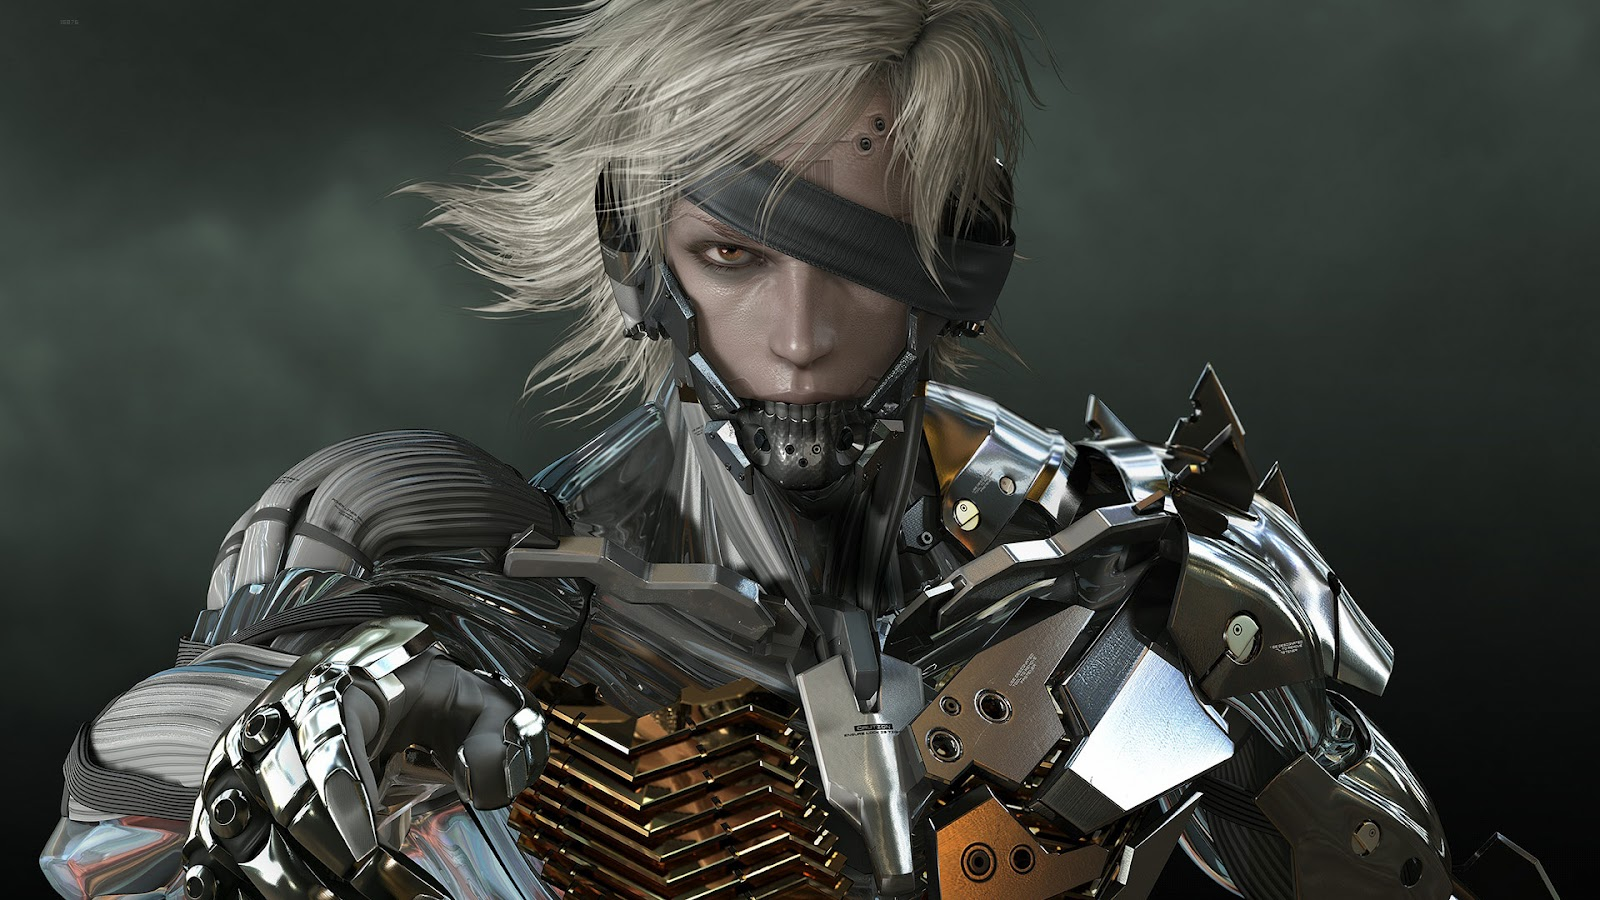 http://2.bp.blogspot.com/-QI5WMQN3688/UBcy9d_bebI/AAAAAAAAHxg/omeebcrDZvo/s1600/metal-gear-solid-rising-581684.jpg